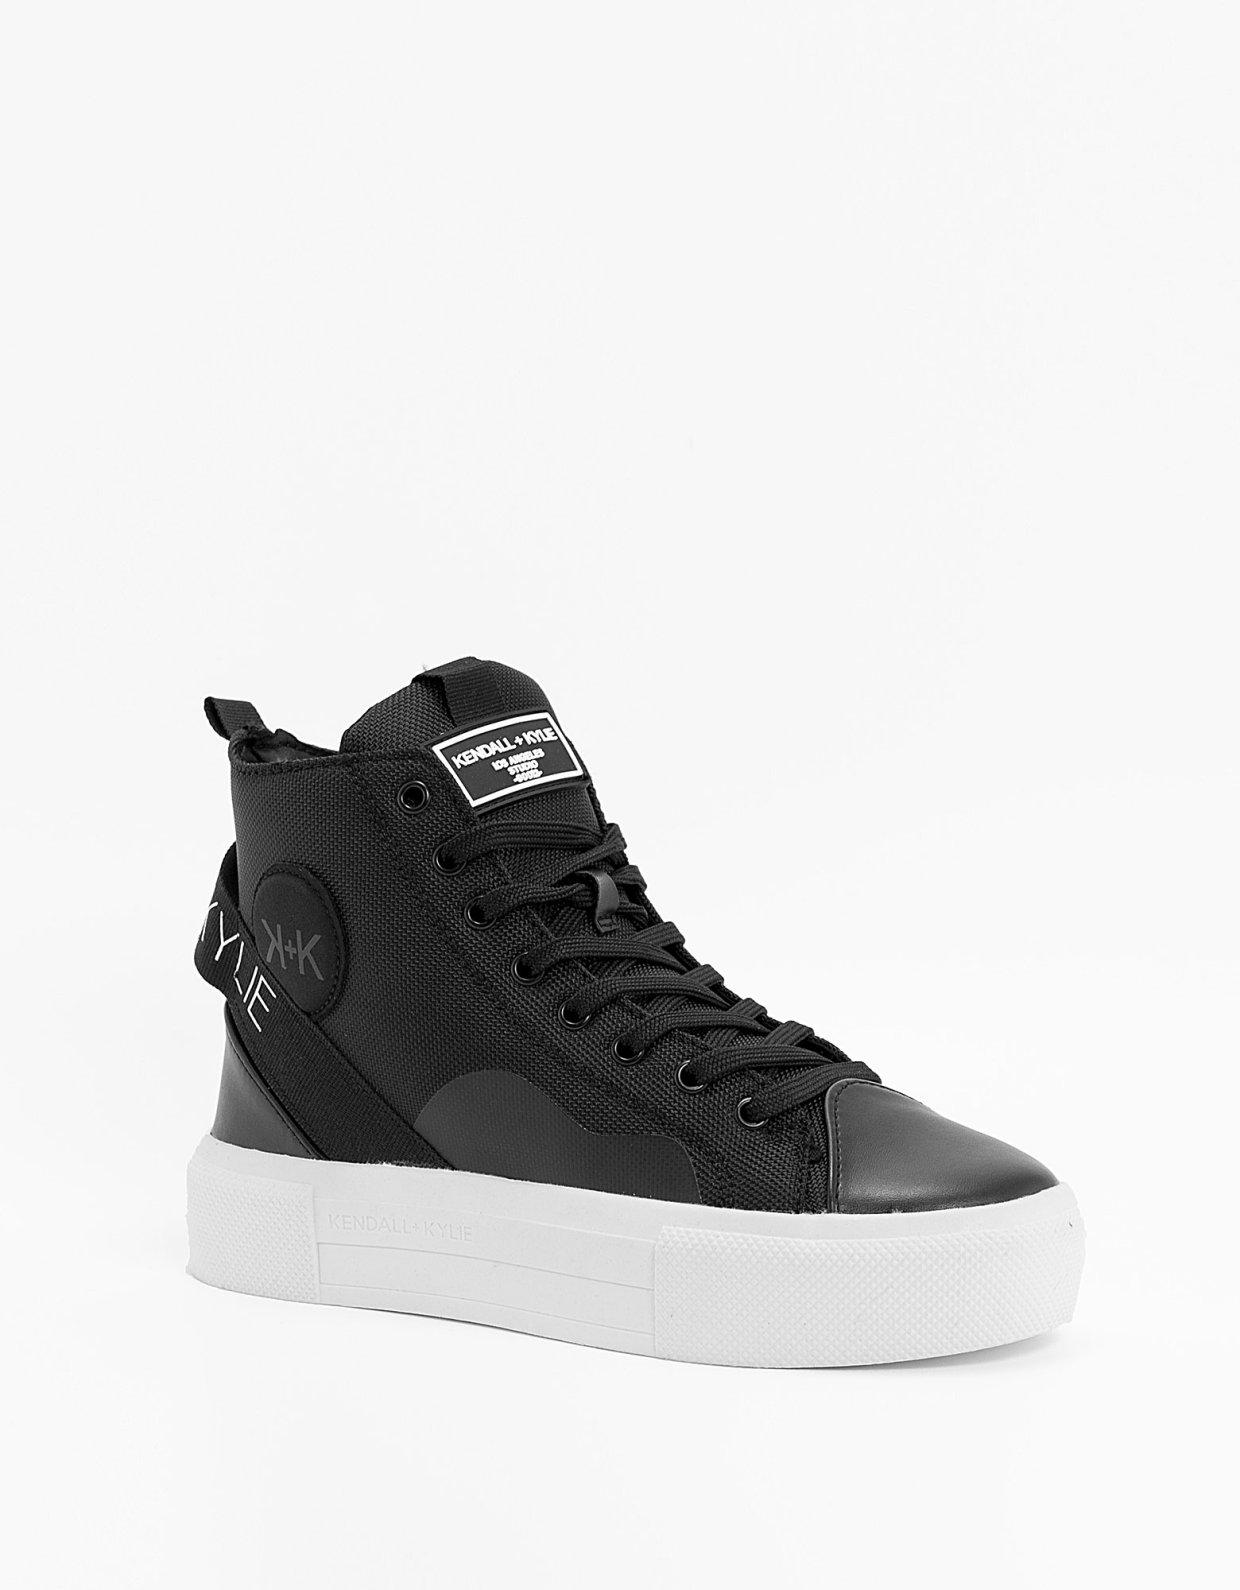 Kendall + Kylie Tamar shoes black